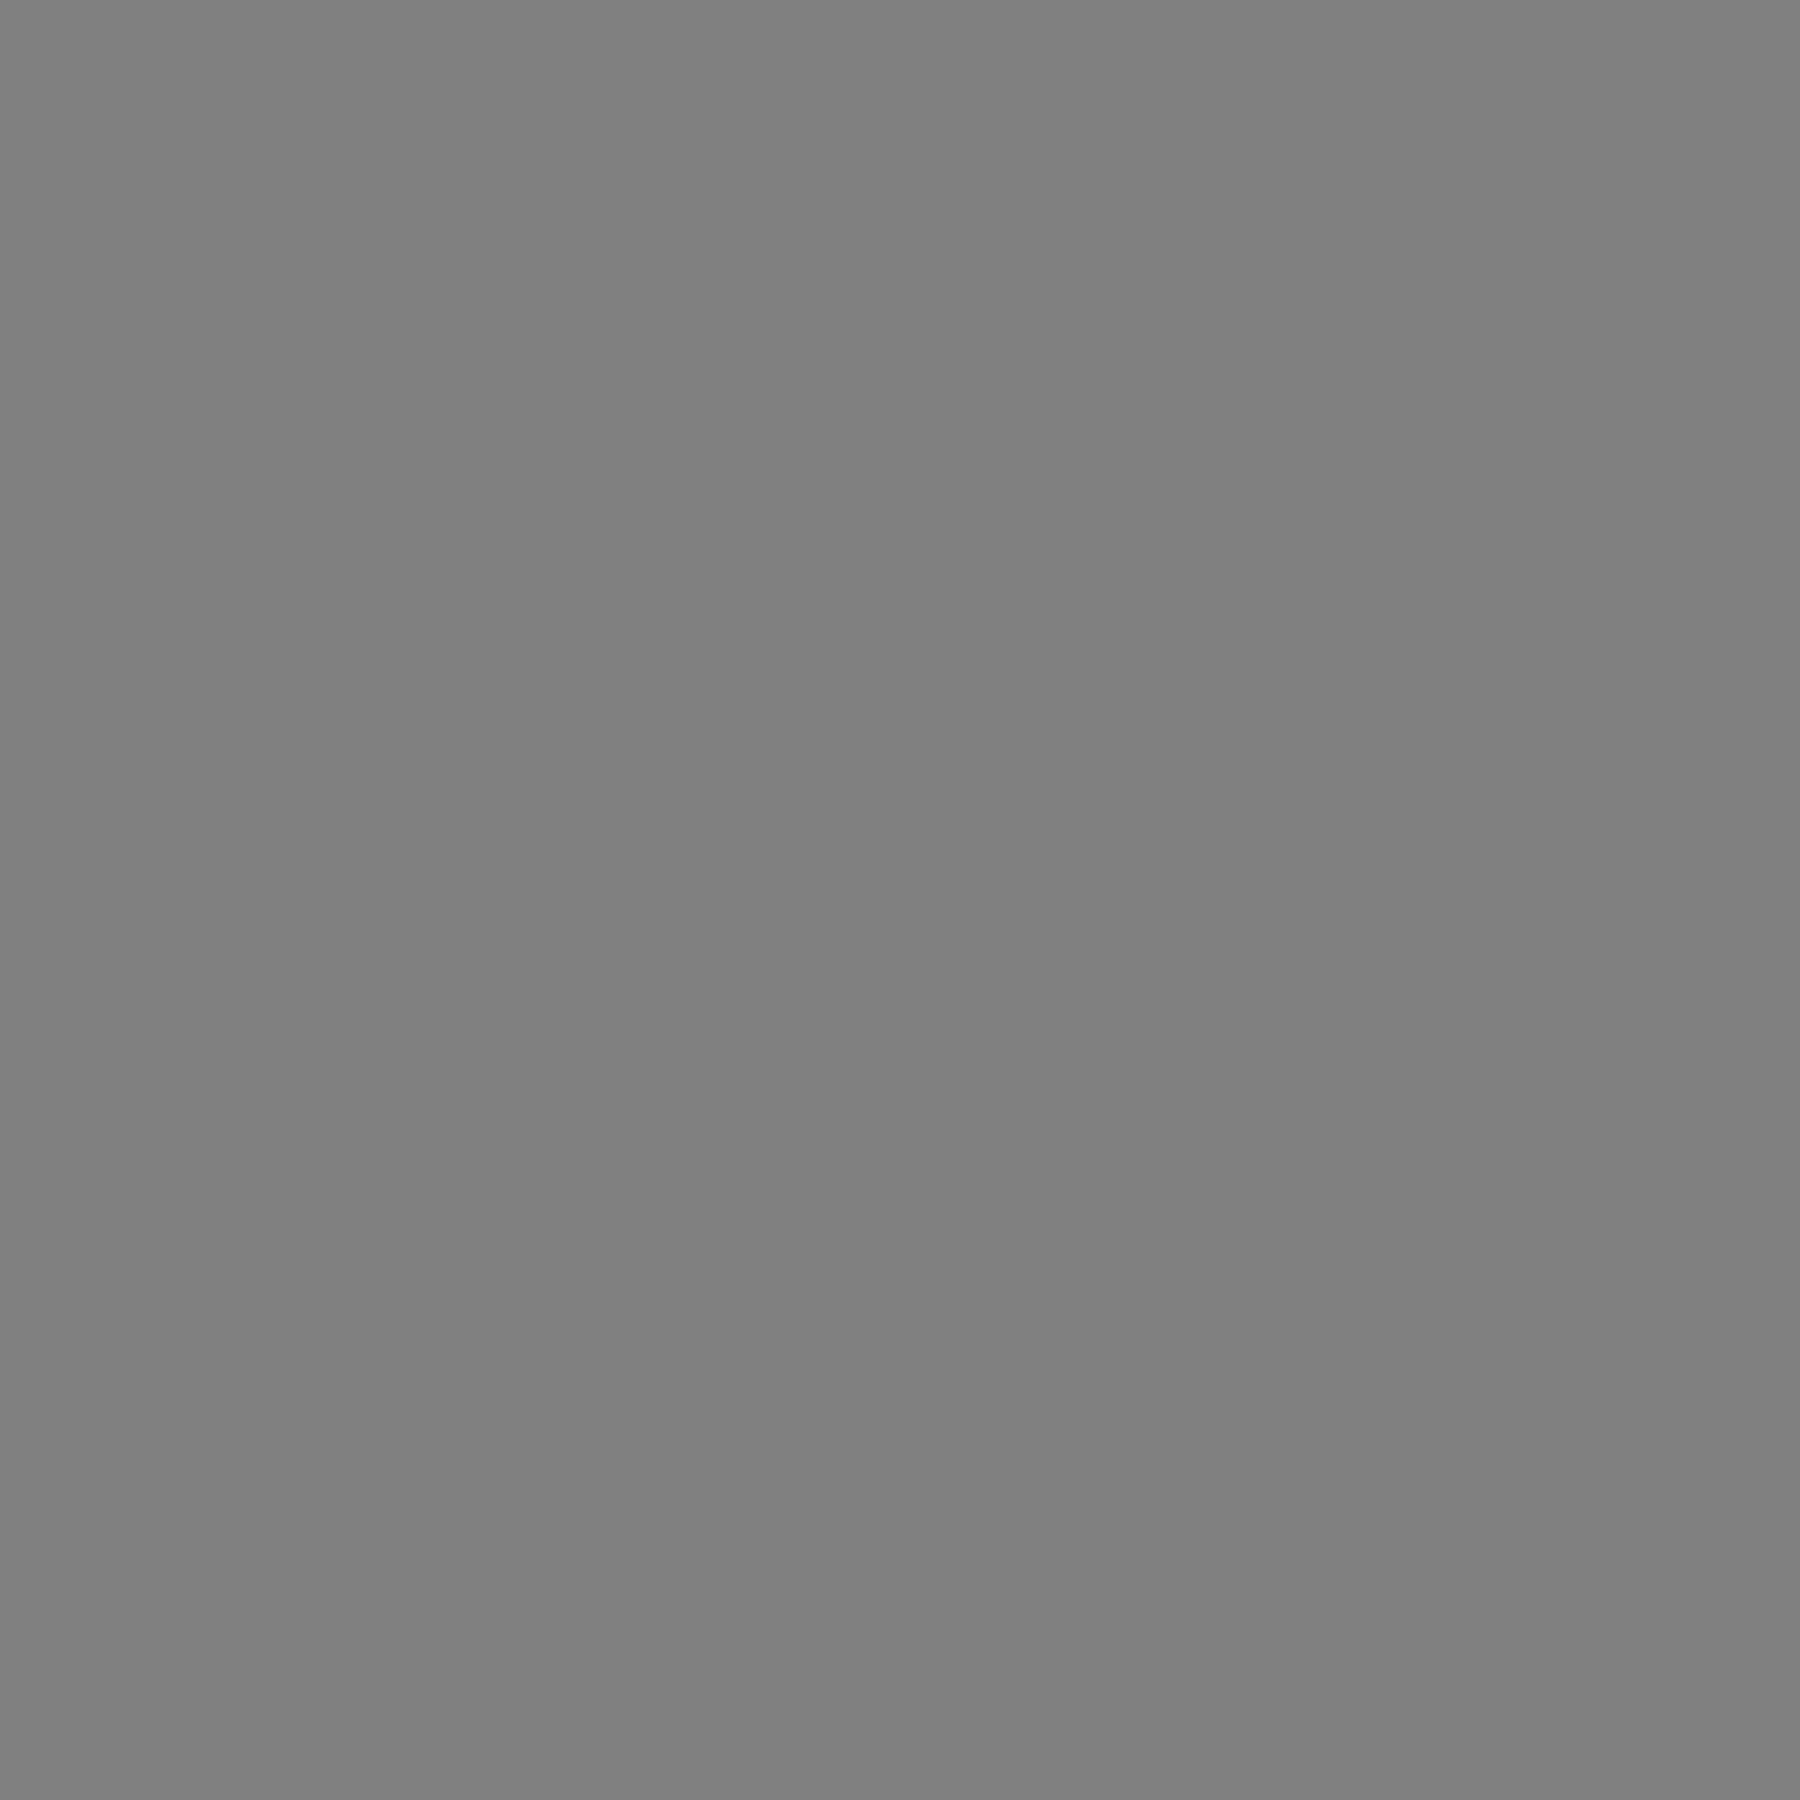 portait placeholder 3.jpg